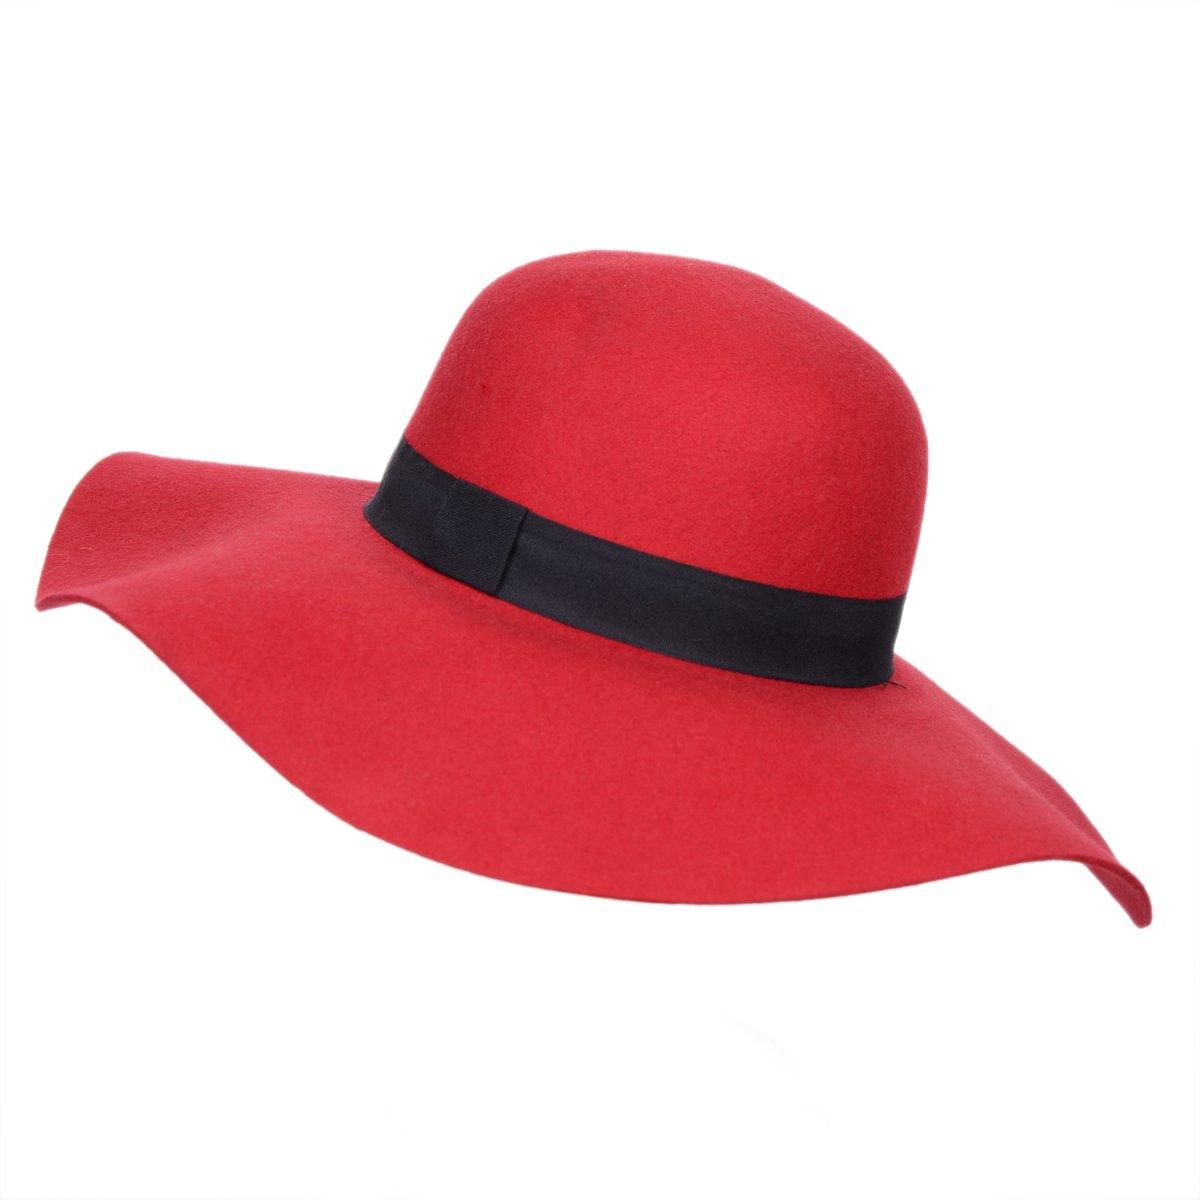 675cf6d6893 Anycosy Women s Wide Brim Vintage Bowler Wool Felt Fedora Floppy Red ...